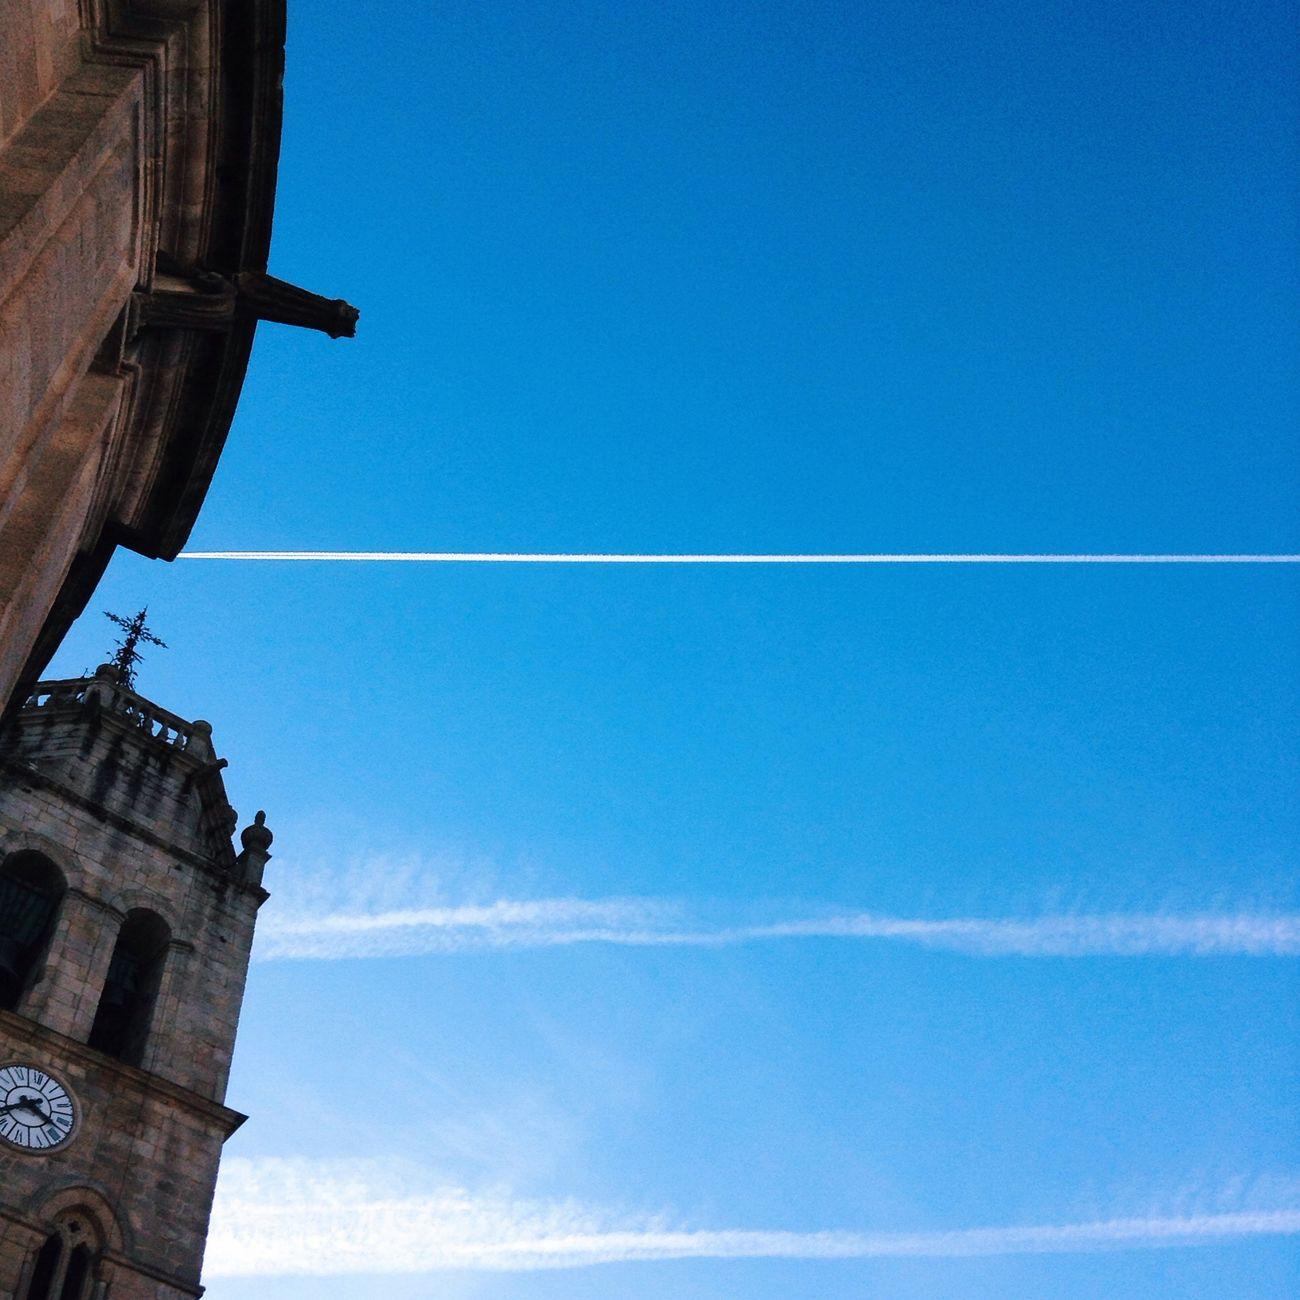 A direct line to god via Catedral De Lugo . Teach the Contrail conspiracy! Shoot, Share, Learn - EyeEm Lugo Meetup